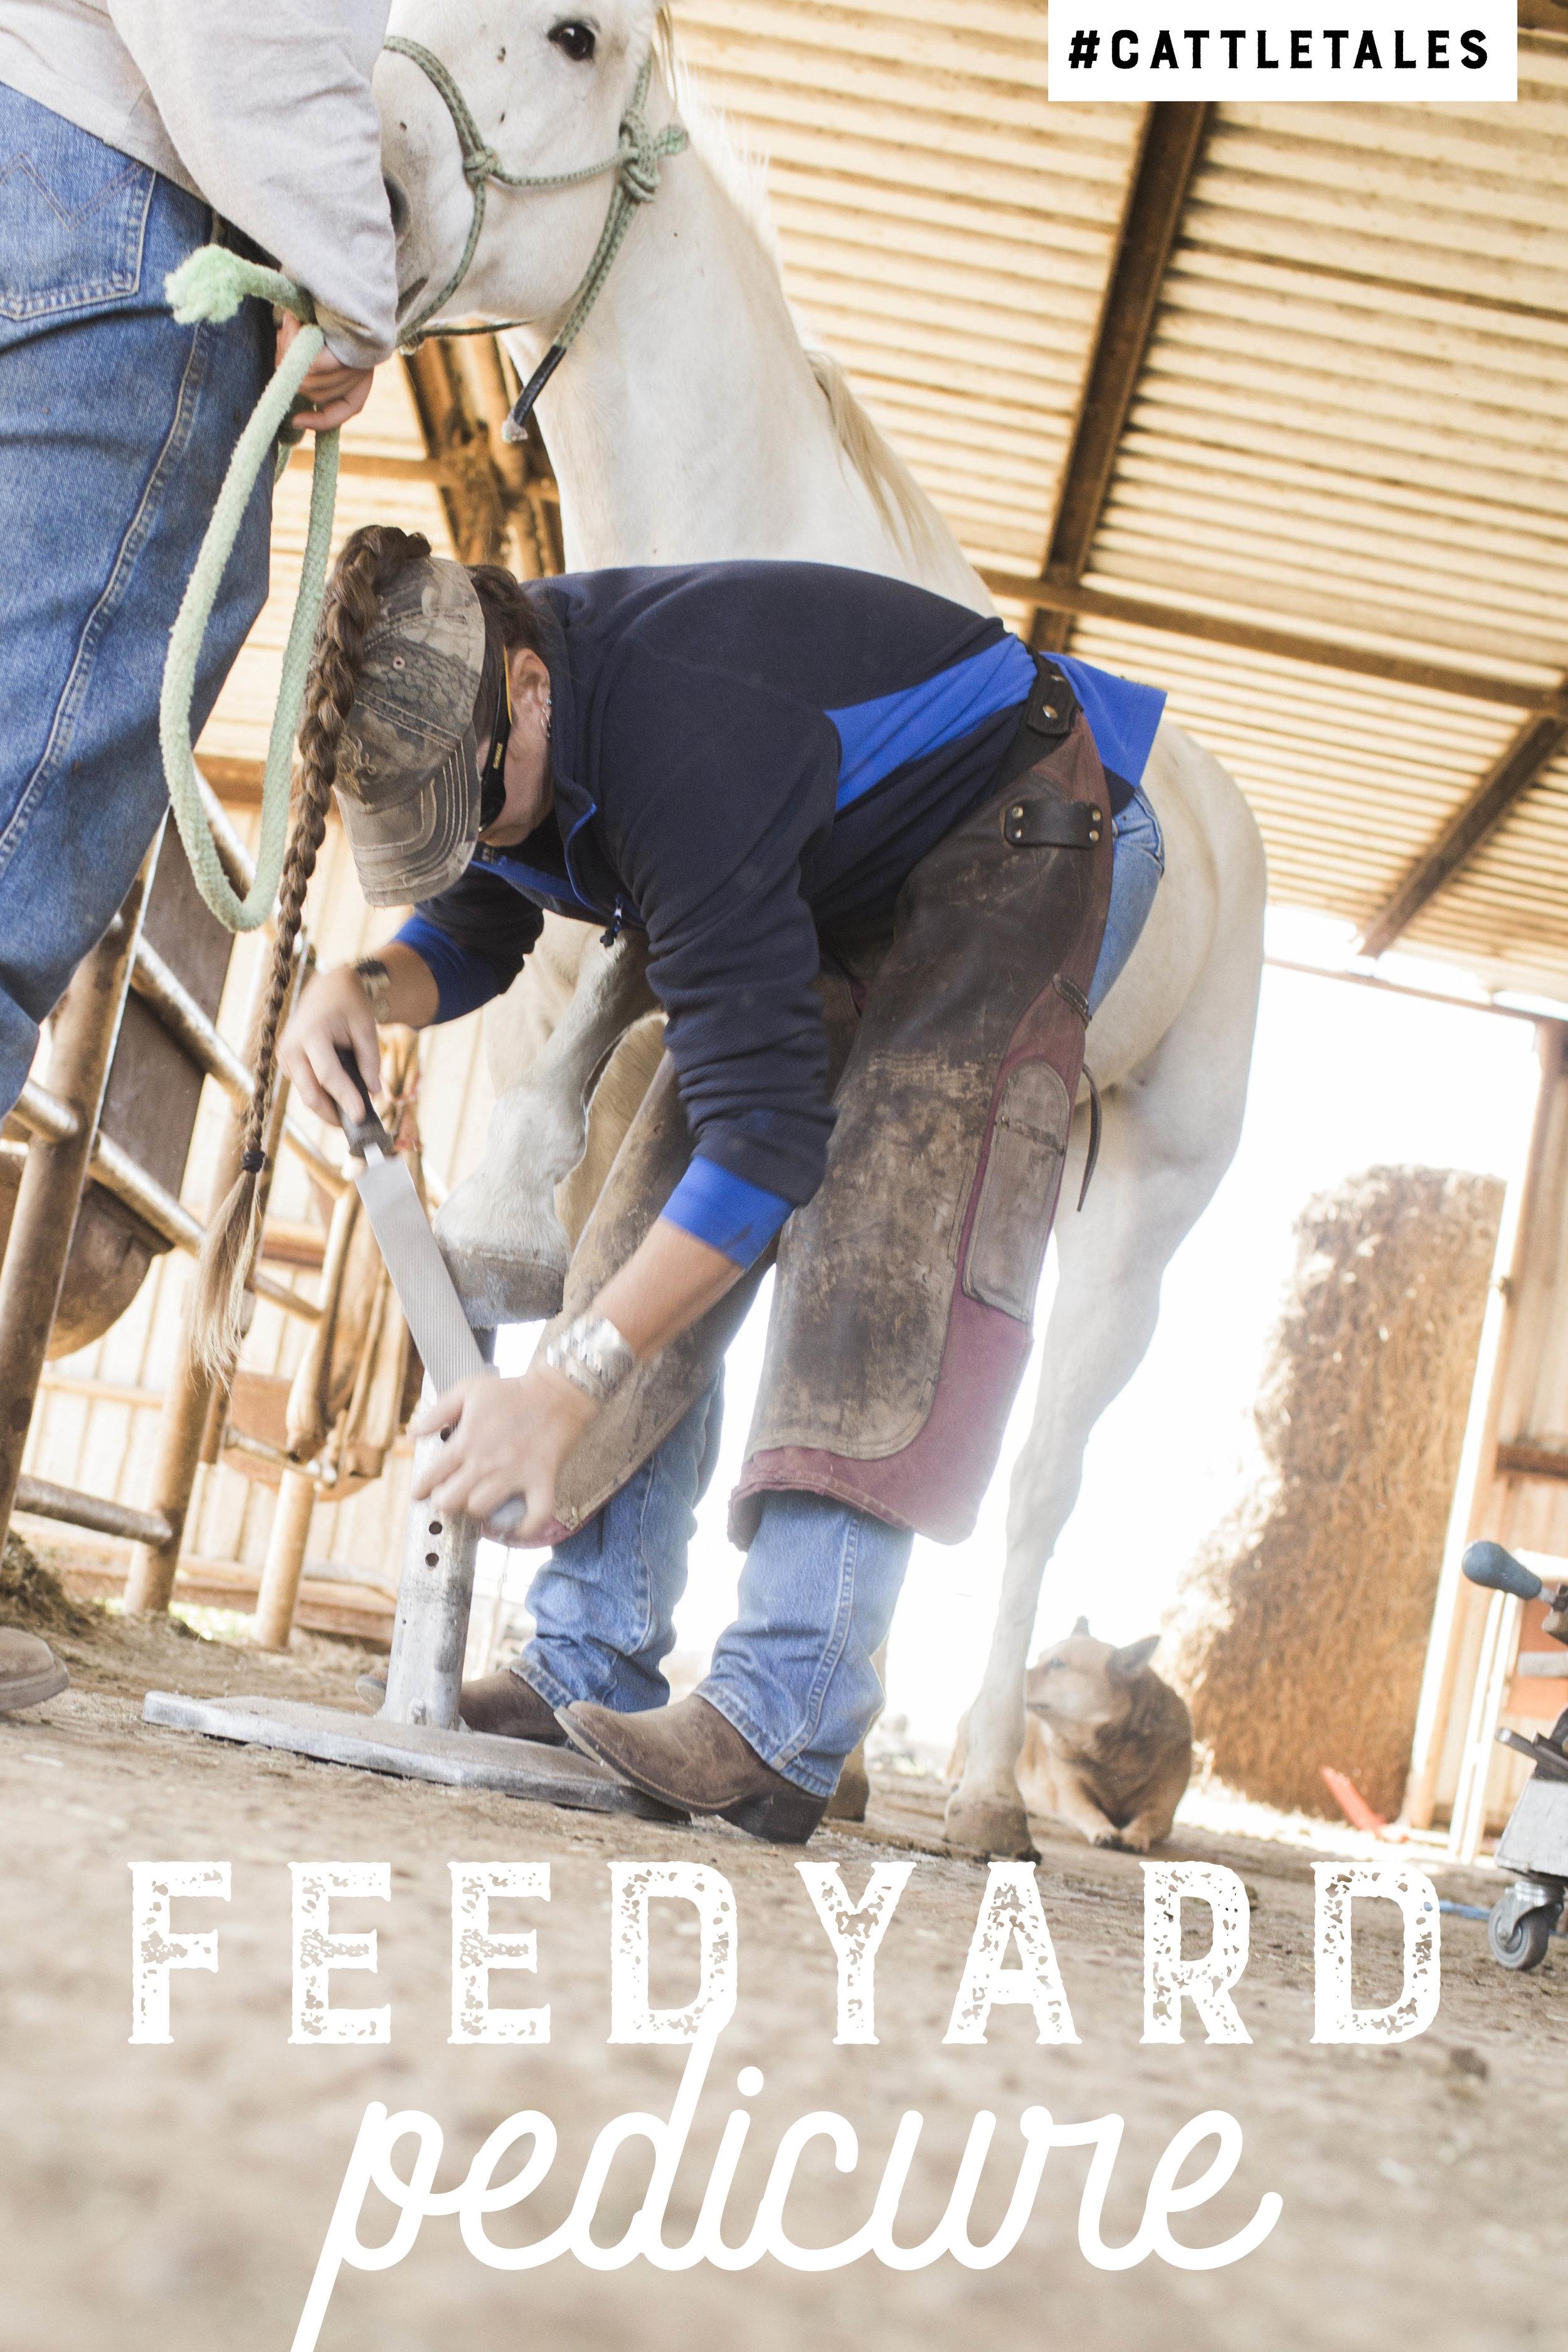 feedyard pedicure.jpg